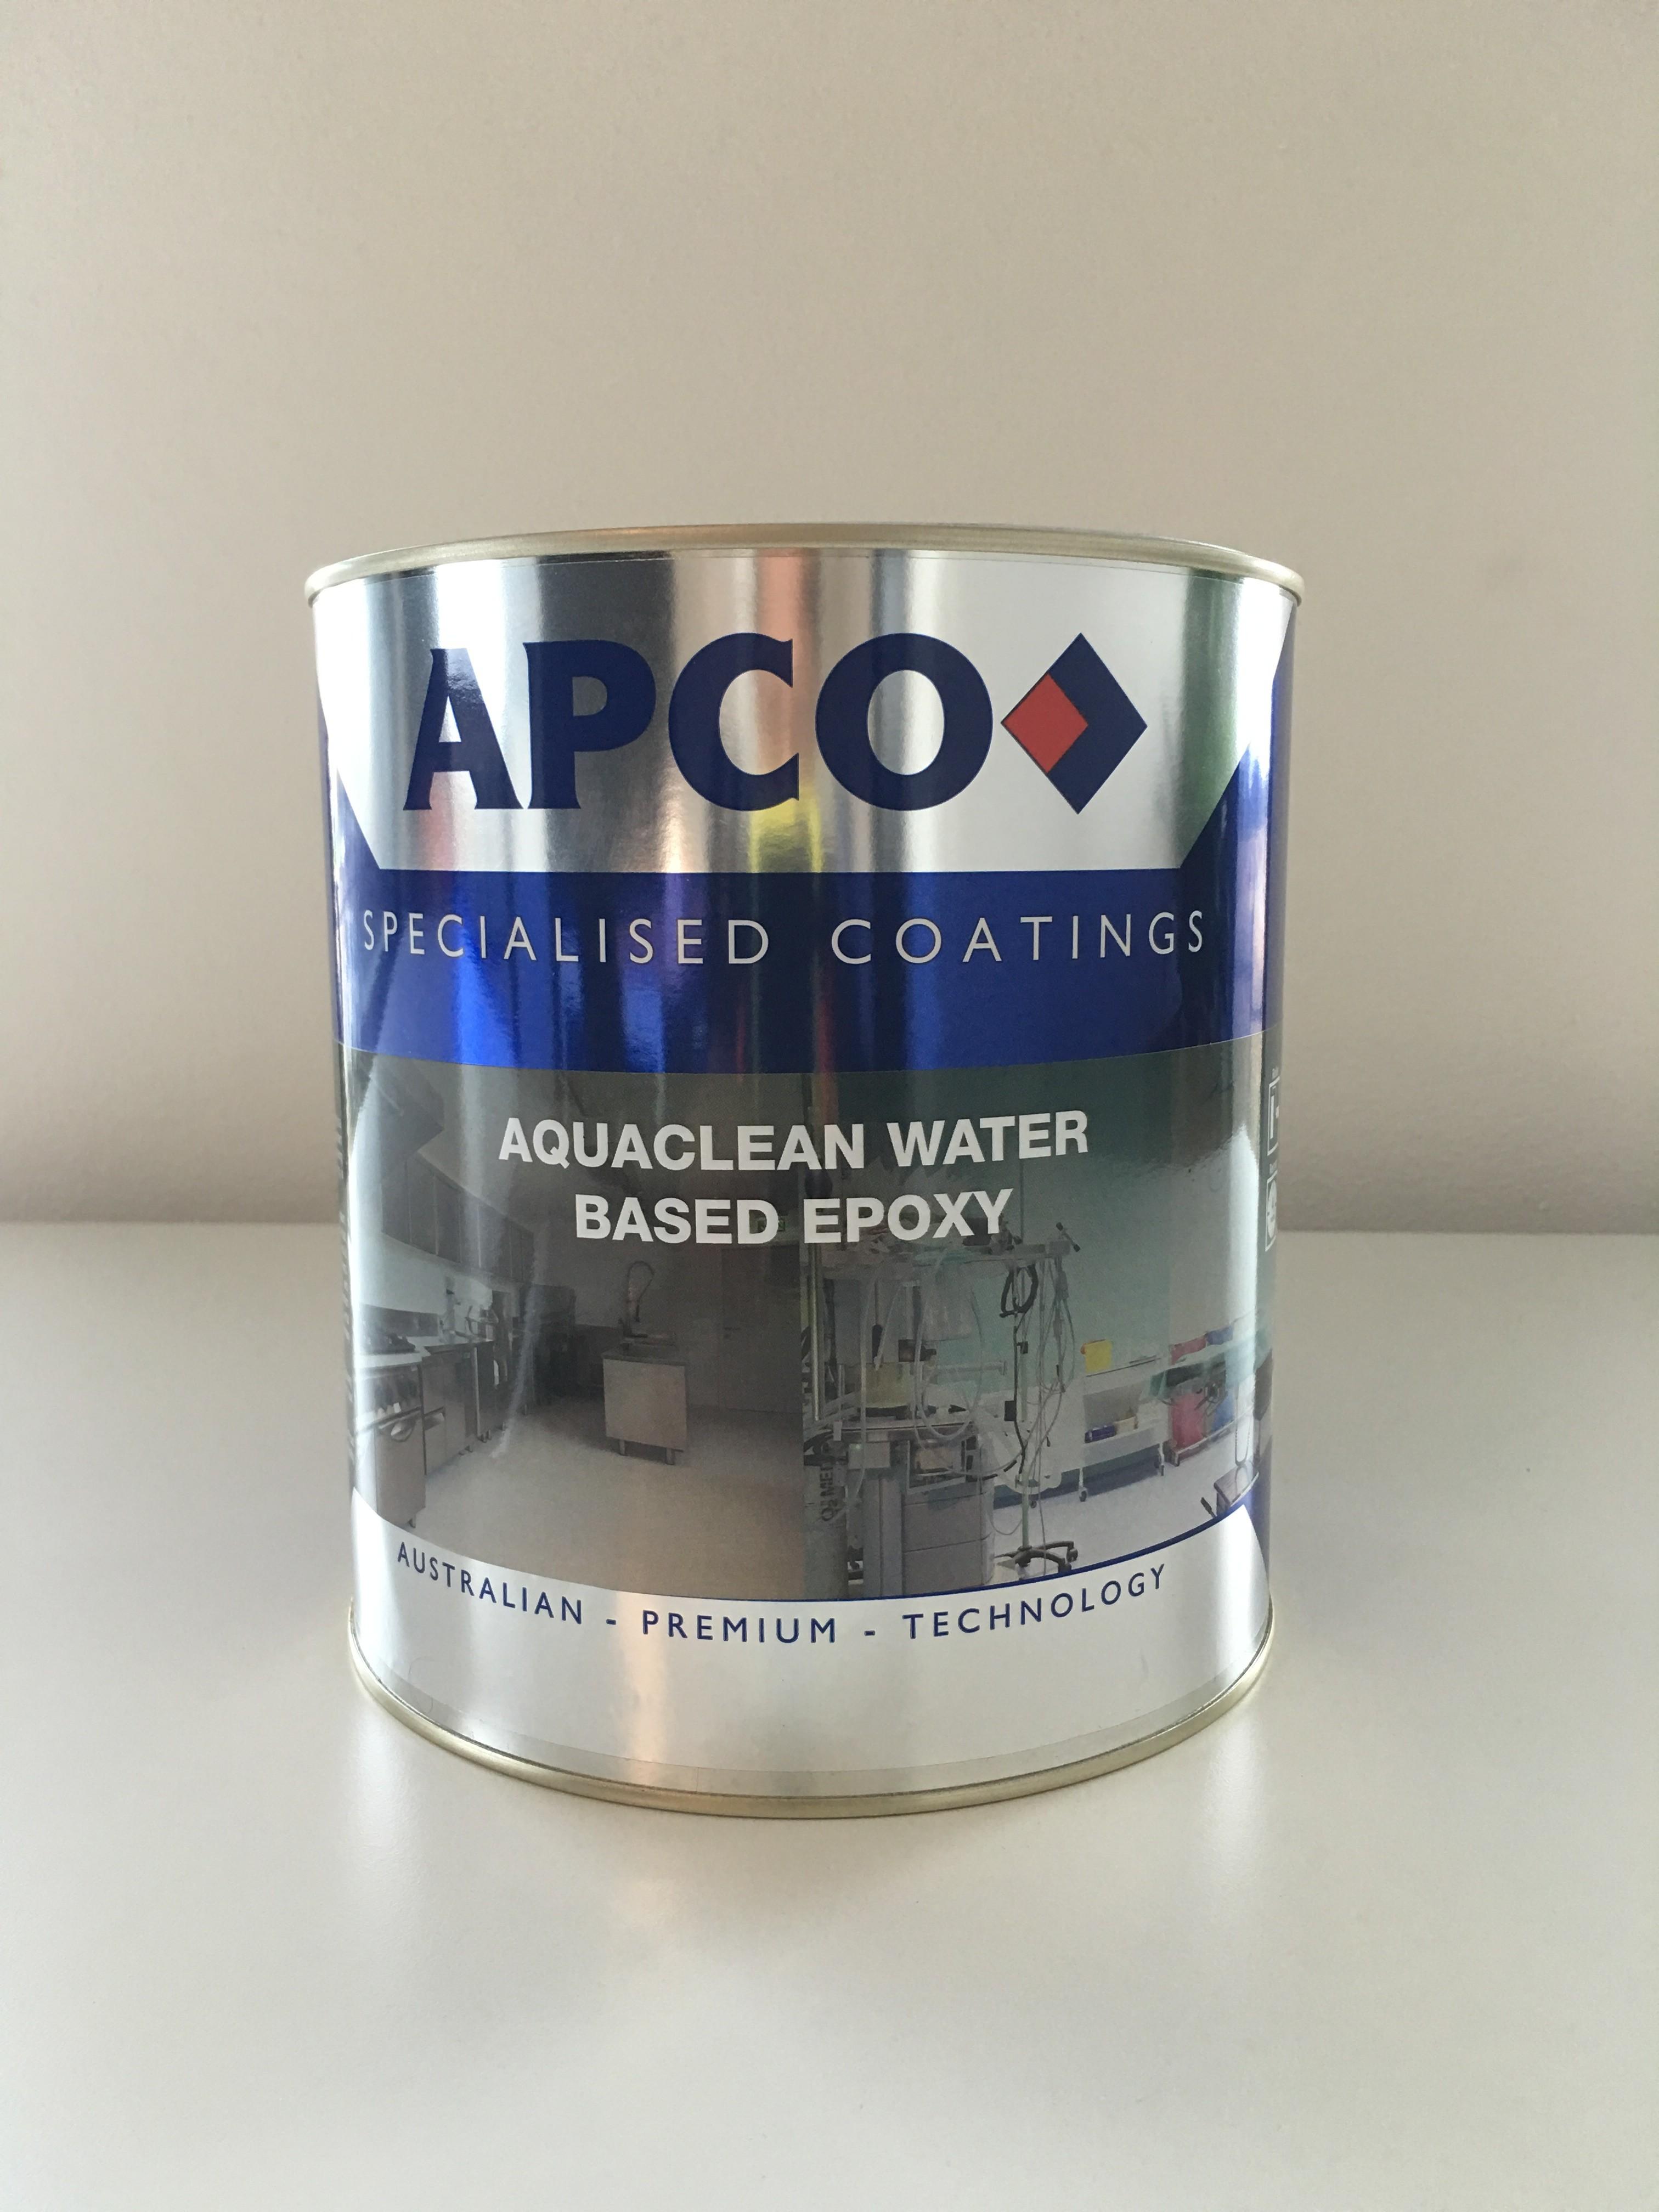 Apco Aquaclean Water Based Epoxy Paint Online